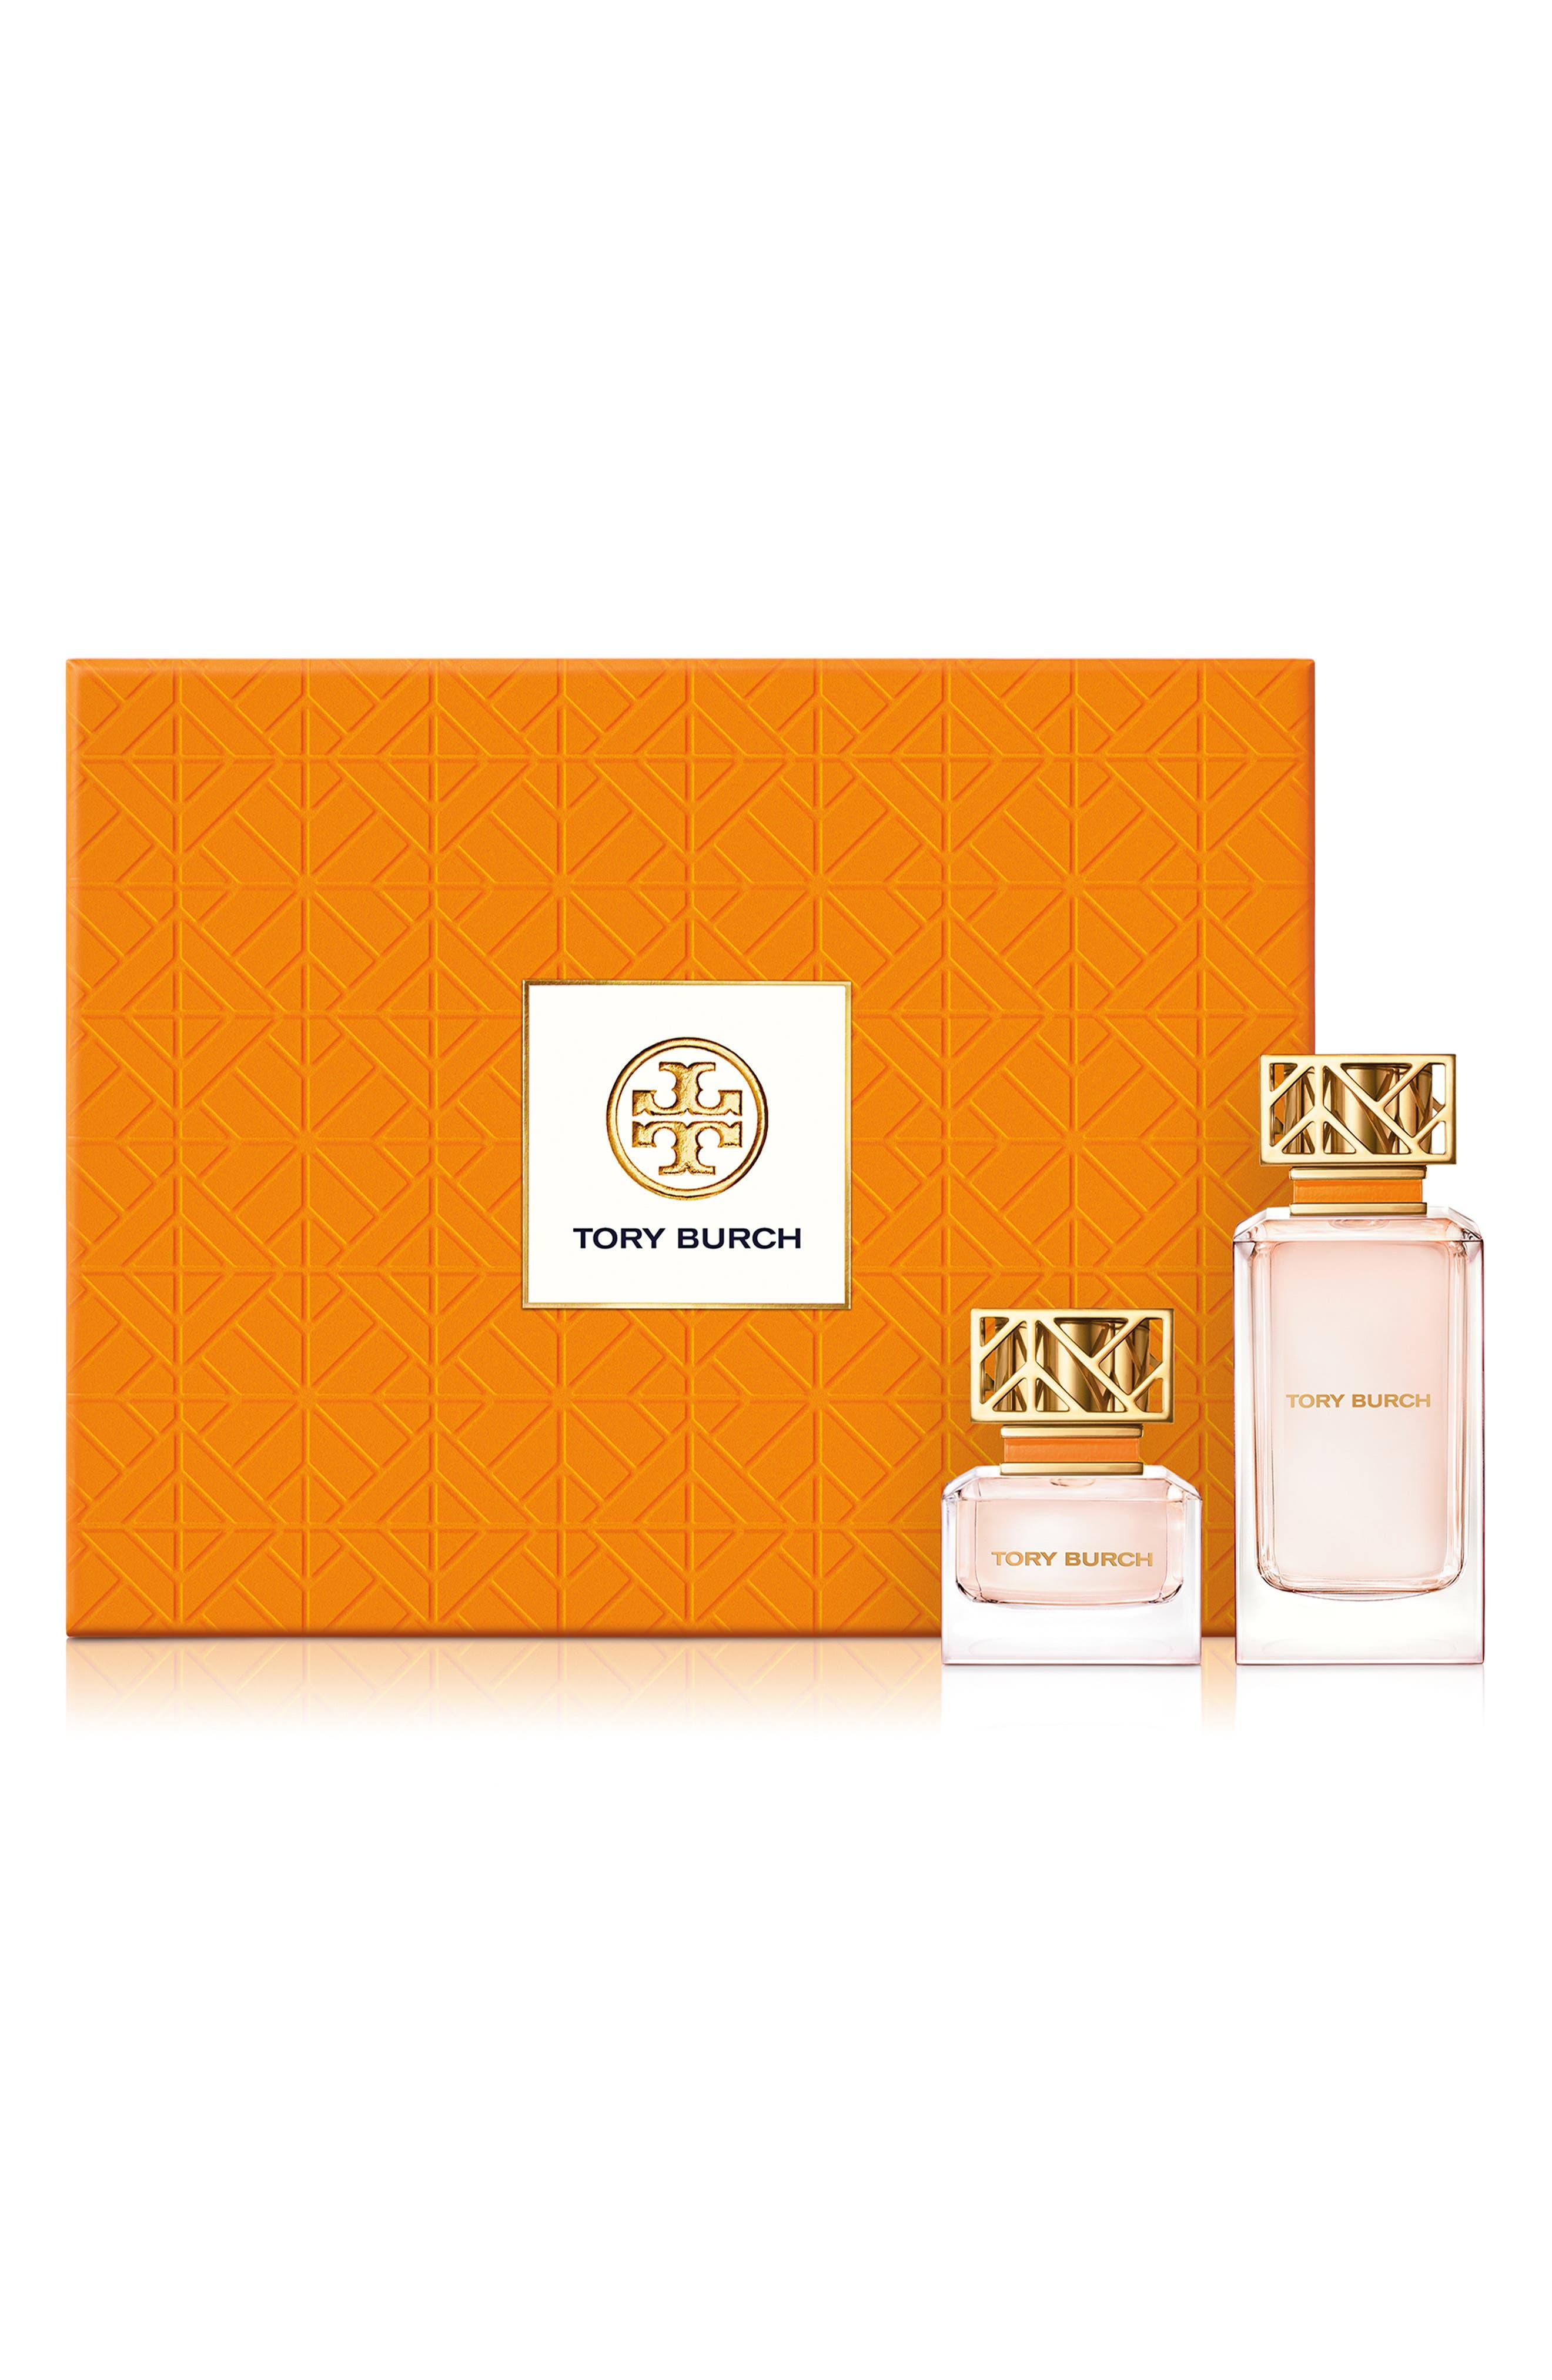 Alternate Image 1 Selected - Tory Burch Fragrance Set ($195 Value)